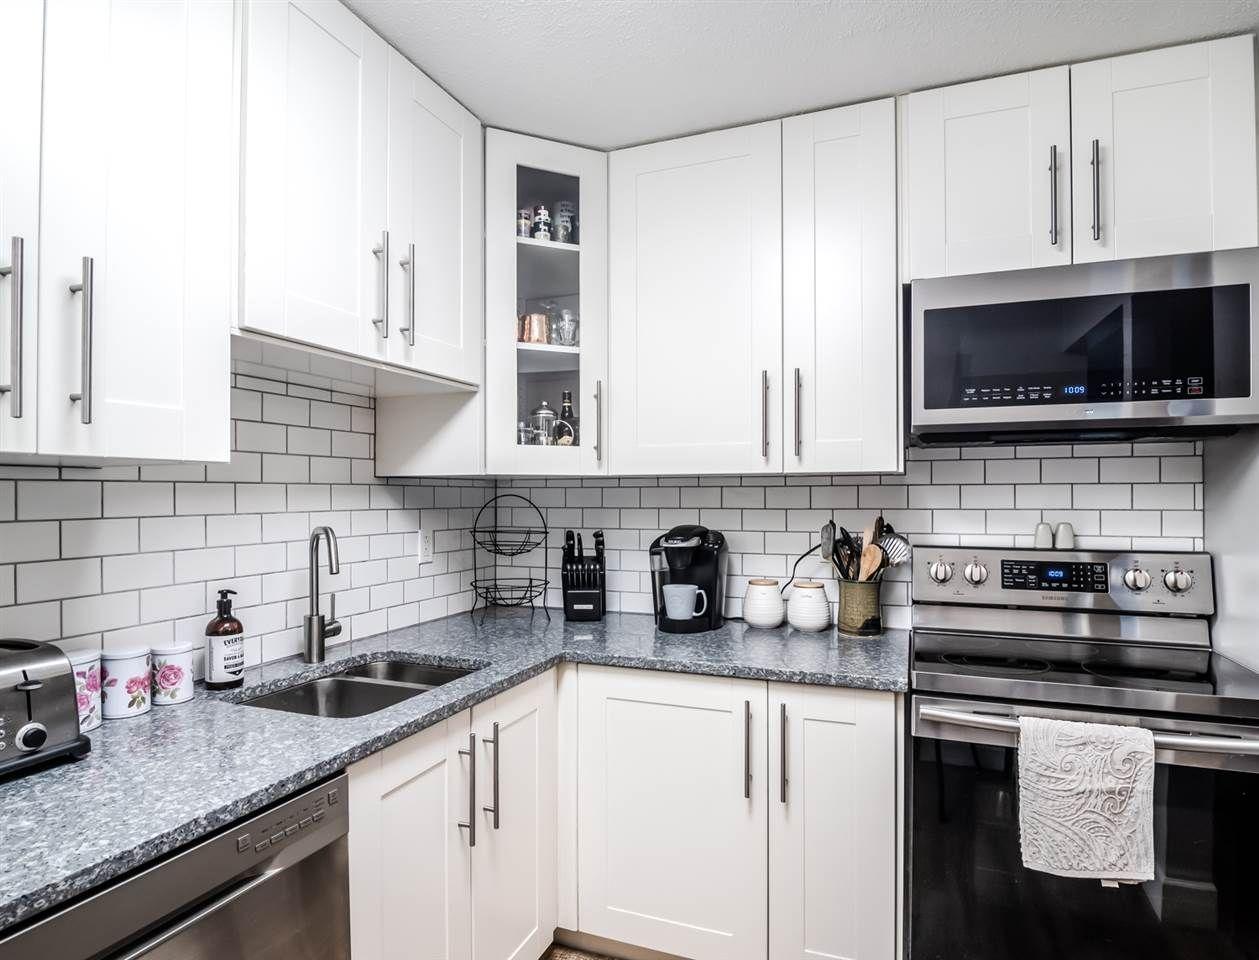 "Main Photo: 329 32850 GEORGE FERGUSON Way in Abbotsford: Central Abbotsford Condo for sale in ""Abbotsford Place"" : MLS®# R2558964"